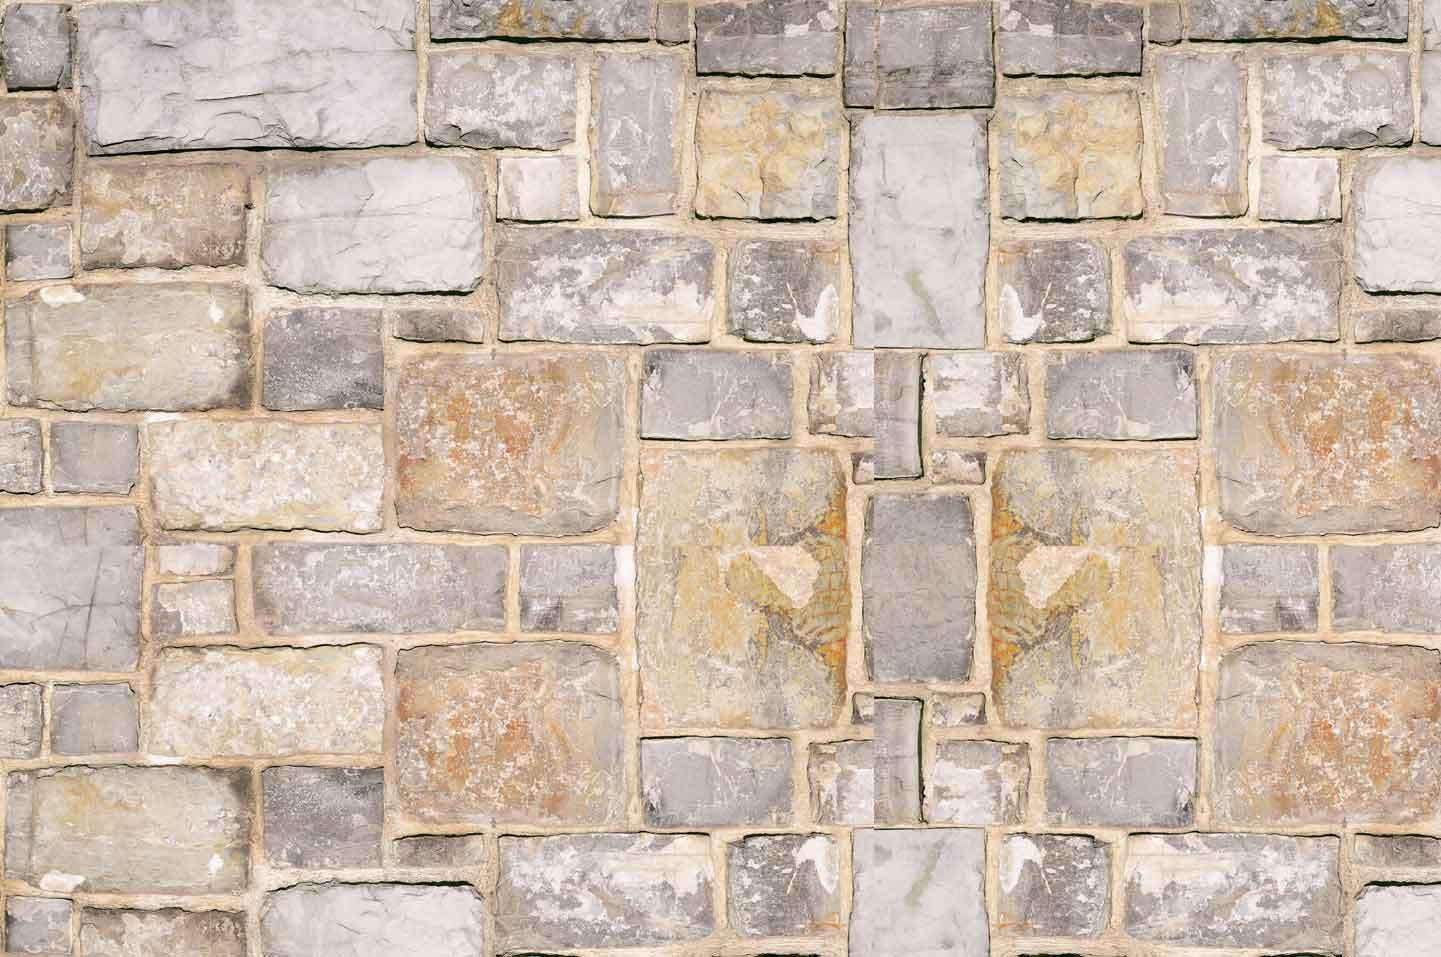 Brick & Masonry Contractor Winnetka